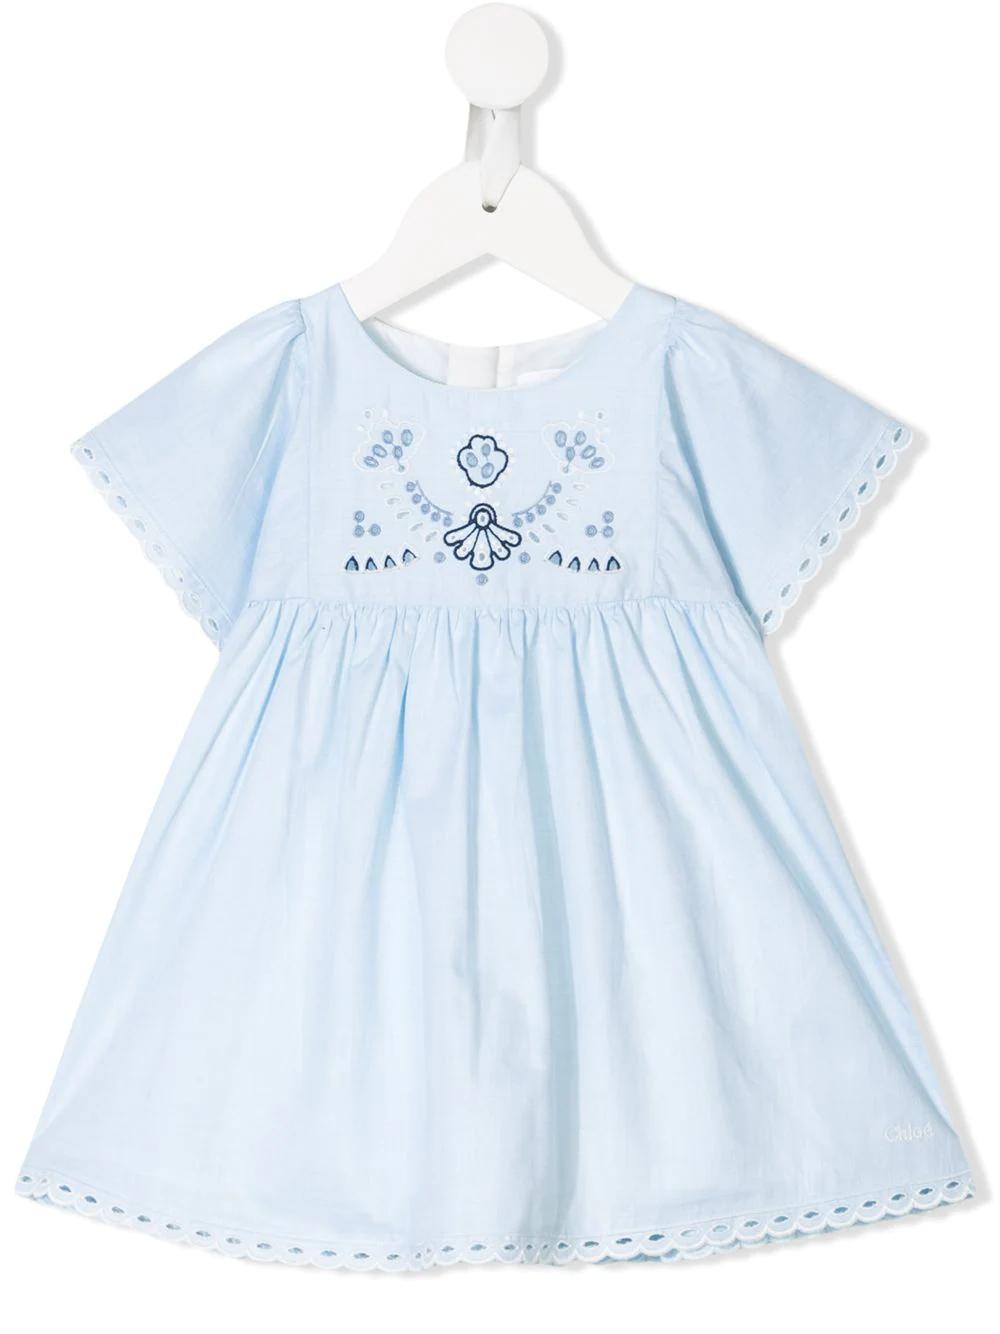 Chloé Kids | платье с вышивкой | Clouty